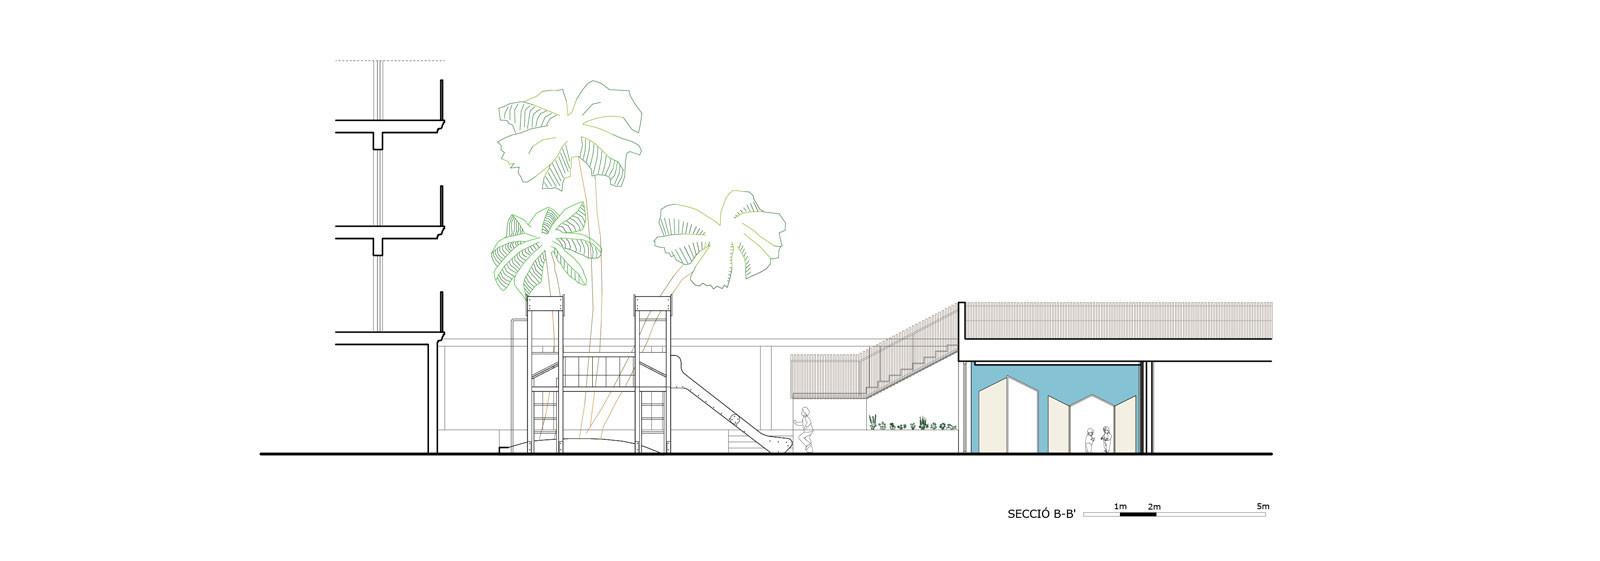 planta-guarderia-AS-BUILD-WEB-05baixa.jpg